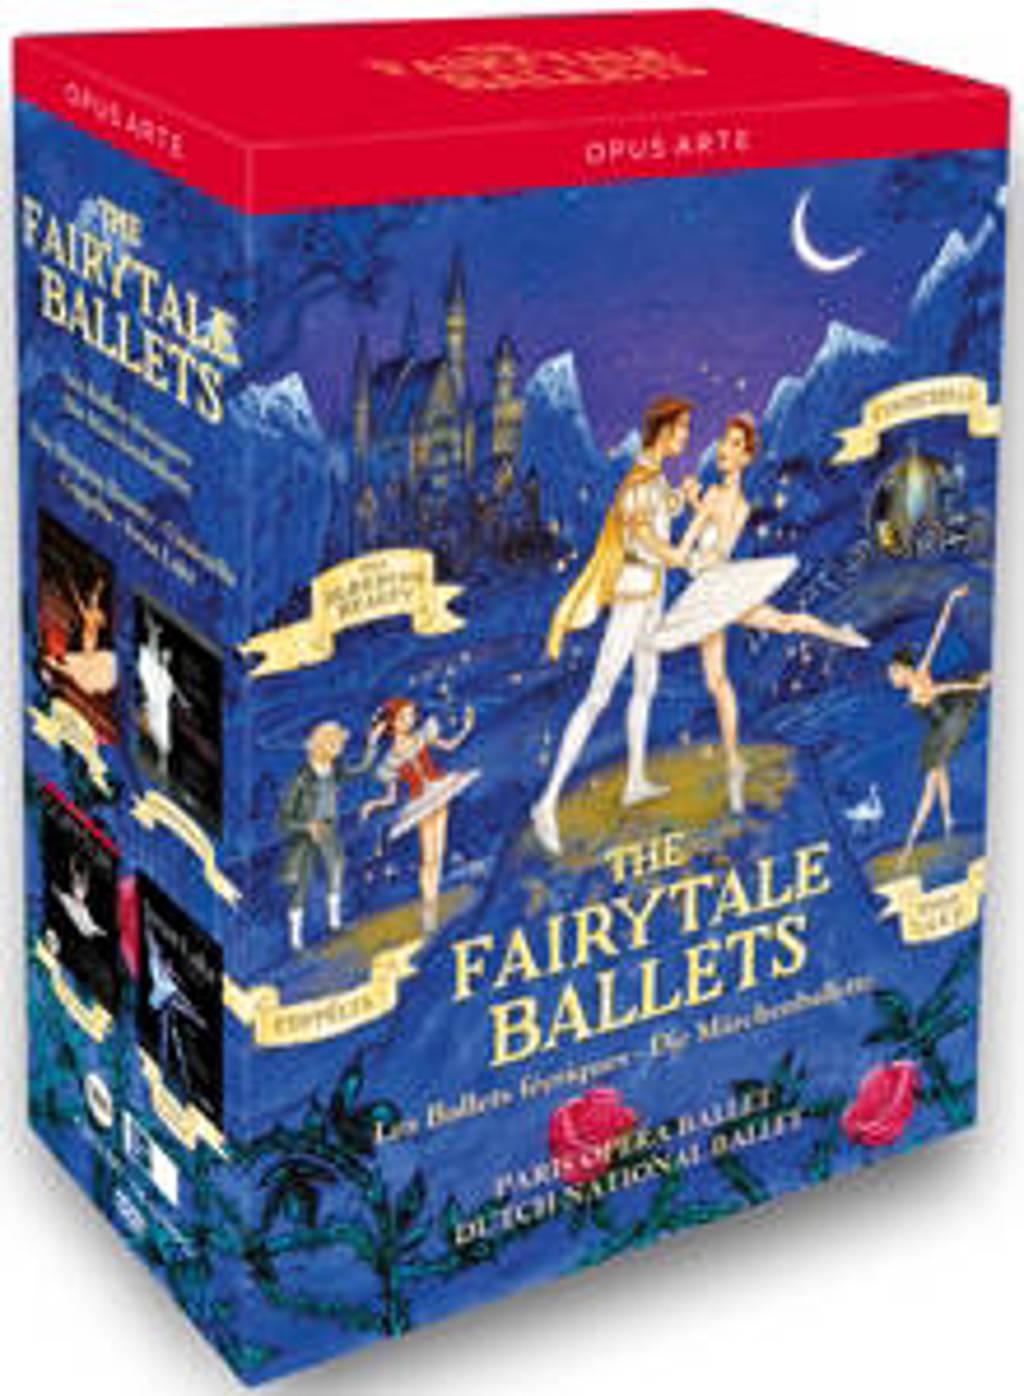 Het Nationale B Paris Opera Ballet - The Fairytale Ballets (DVD)